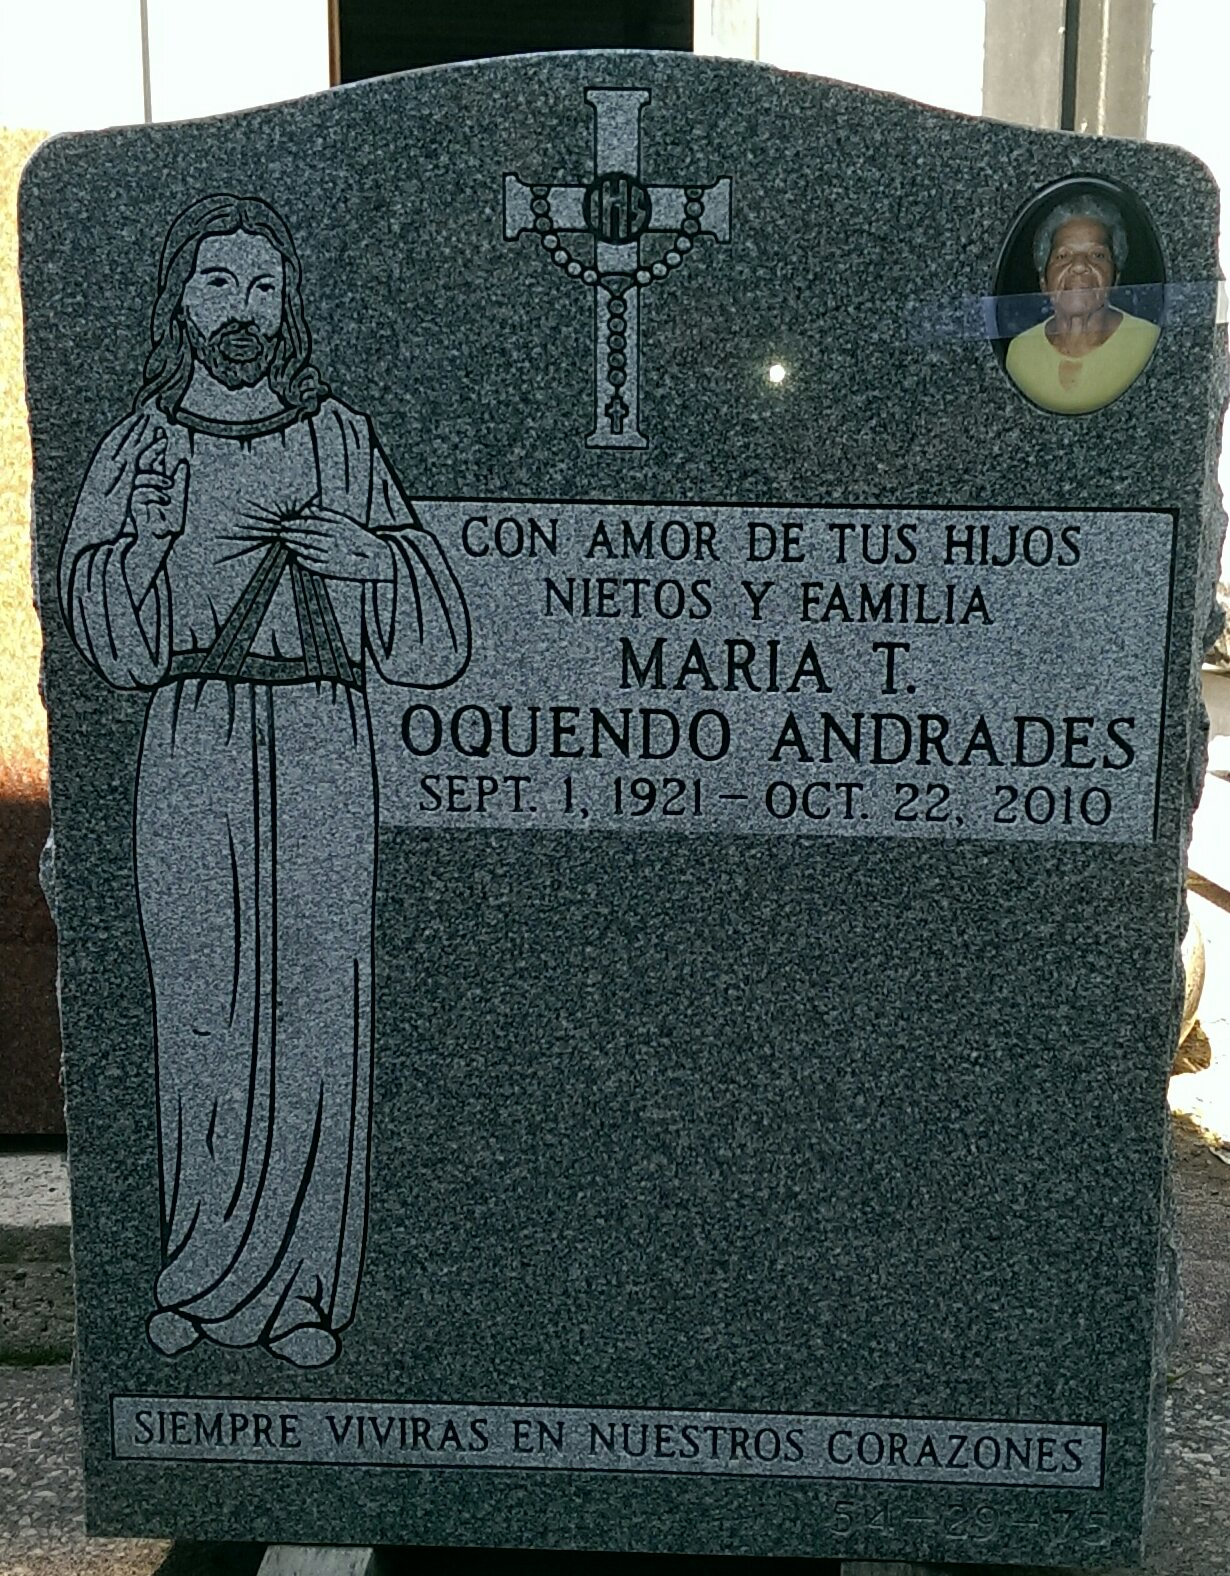 M. Andrades